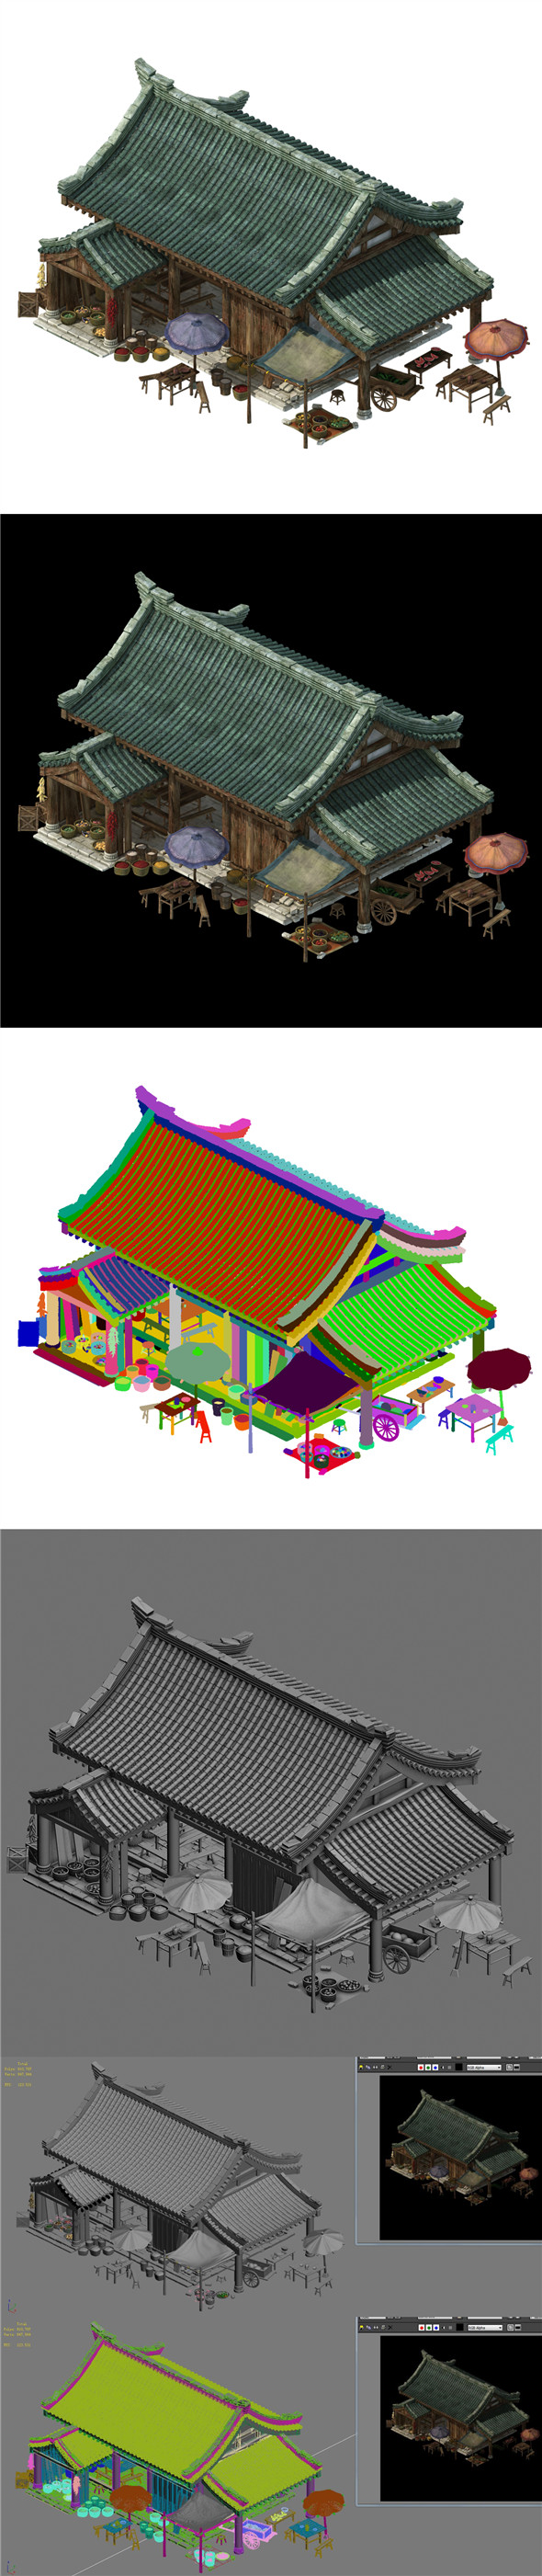 Huaihe River Building - Shop 03 - 3DOcean Item for Sale